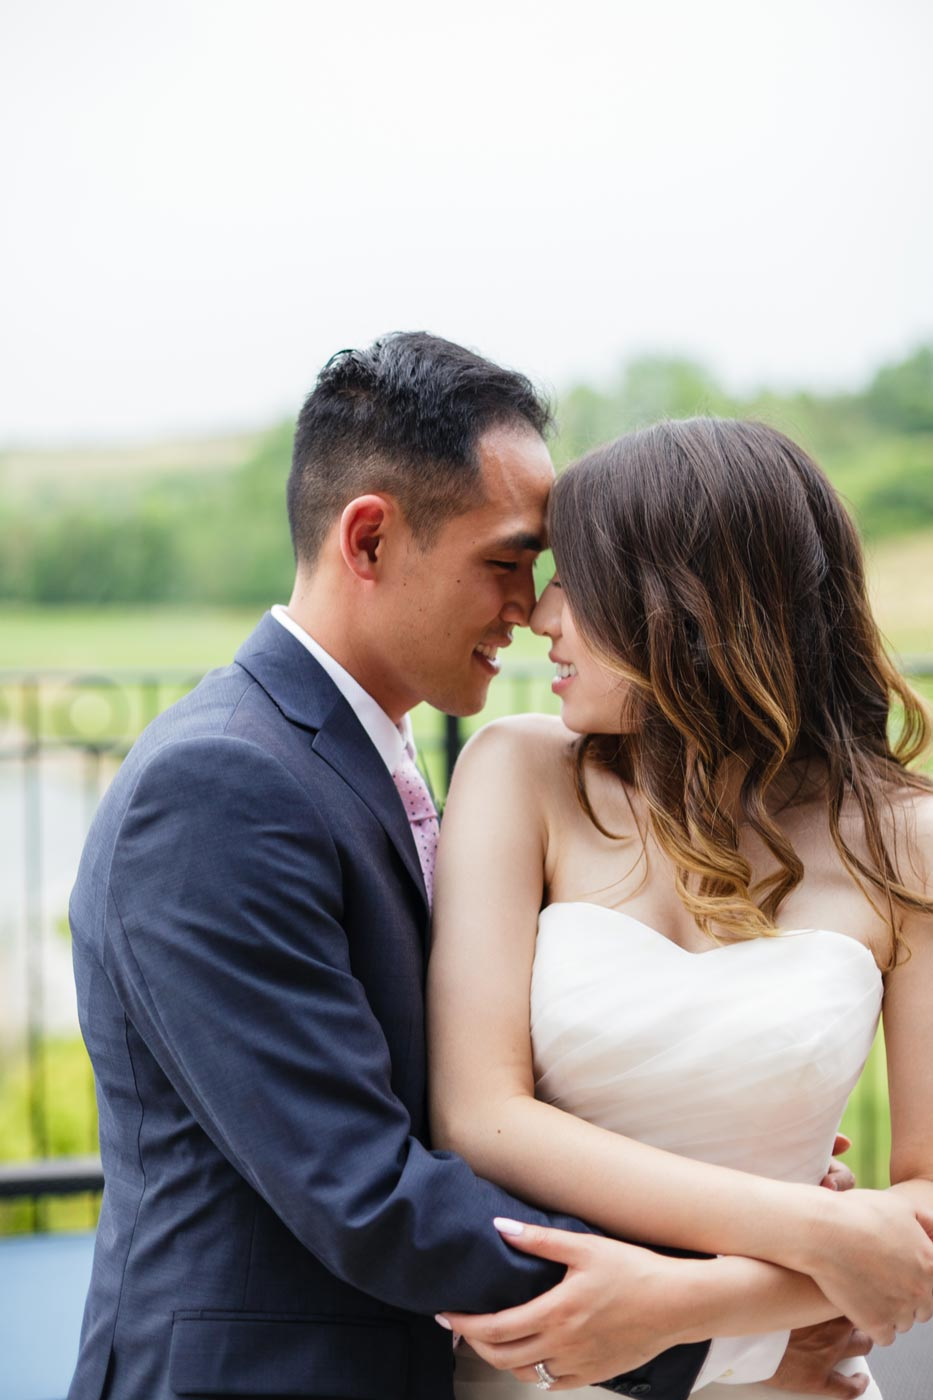 jessicahoang-savi-toronto-wedding-eagles-nest-29